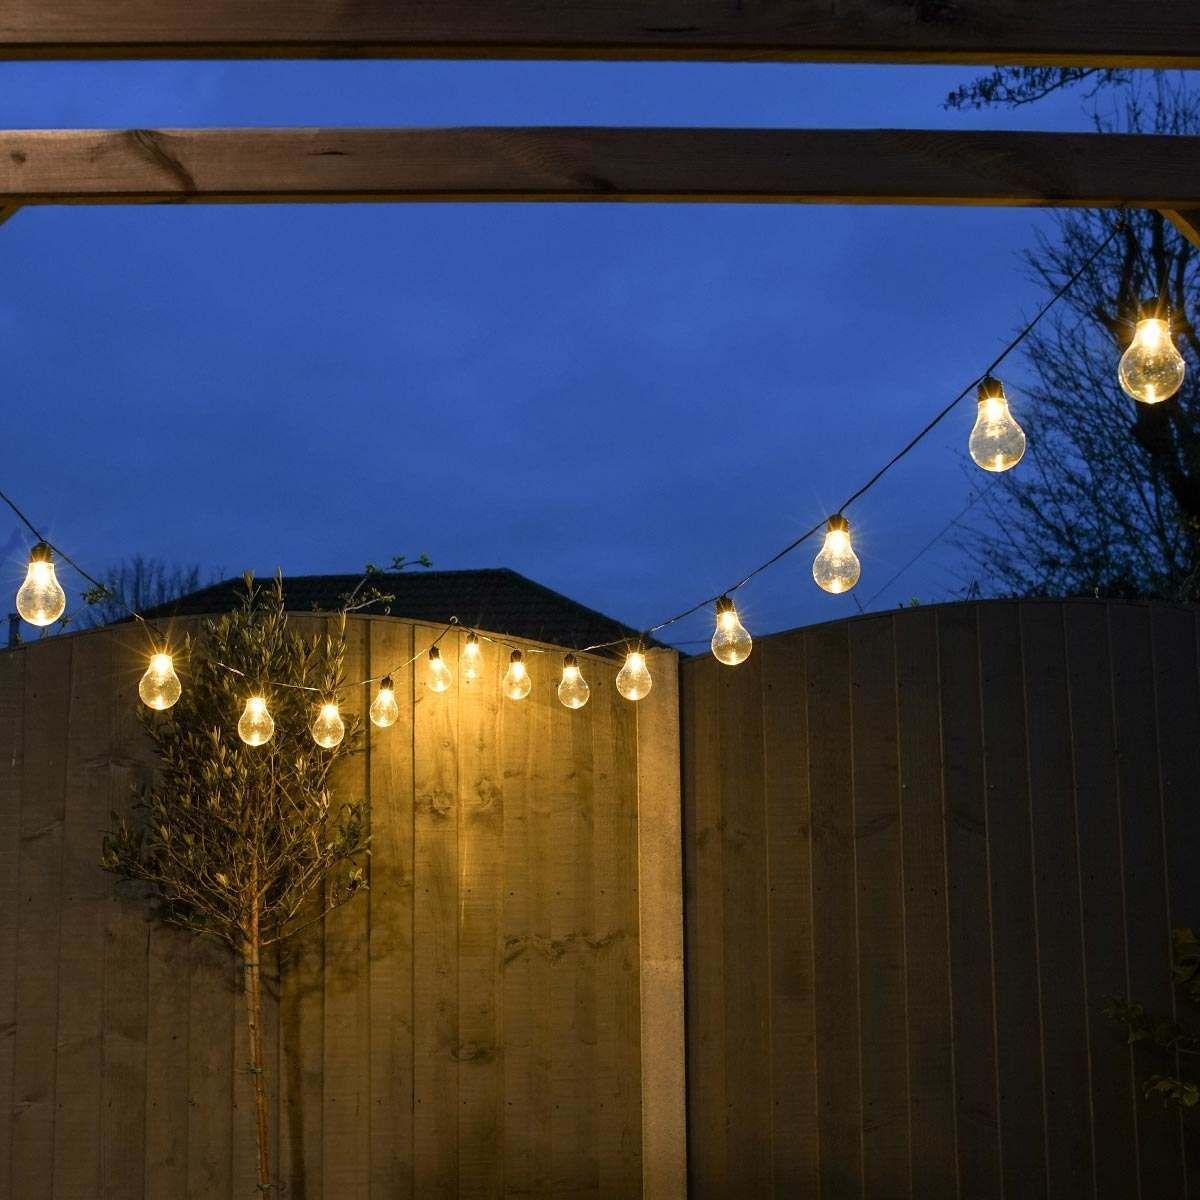 Outdoor Plug In A60 Warm White Led Festoon Lights Festoon Lighting Festoon Outdoor